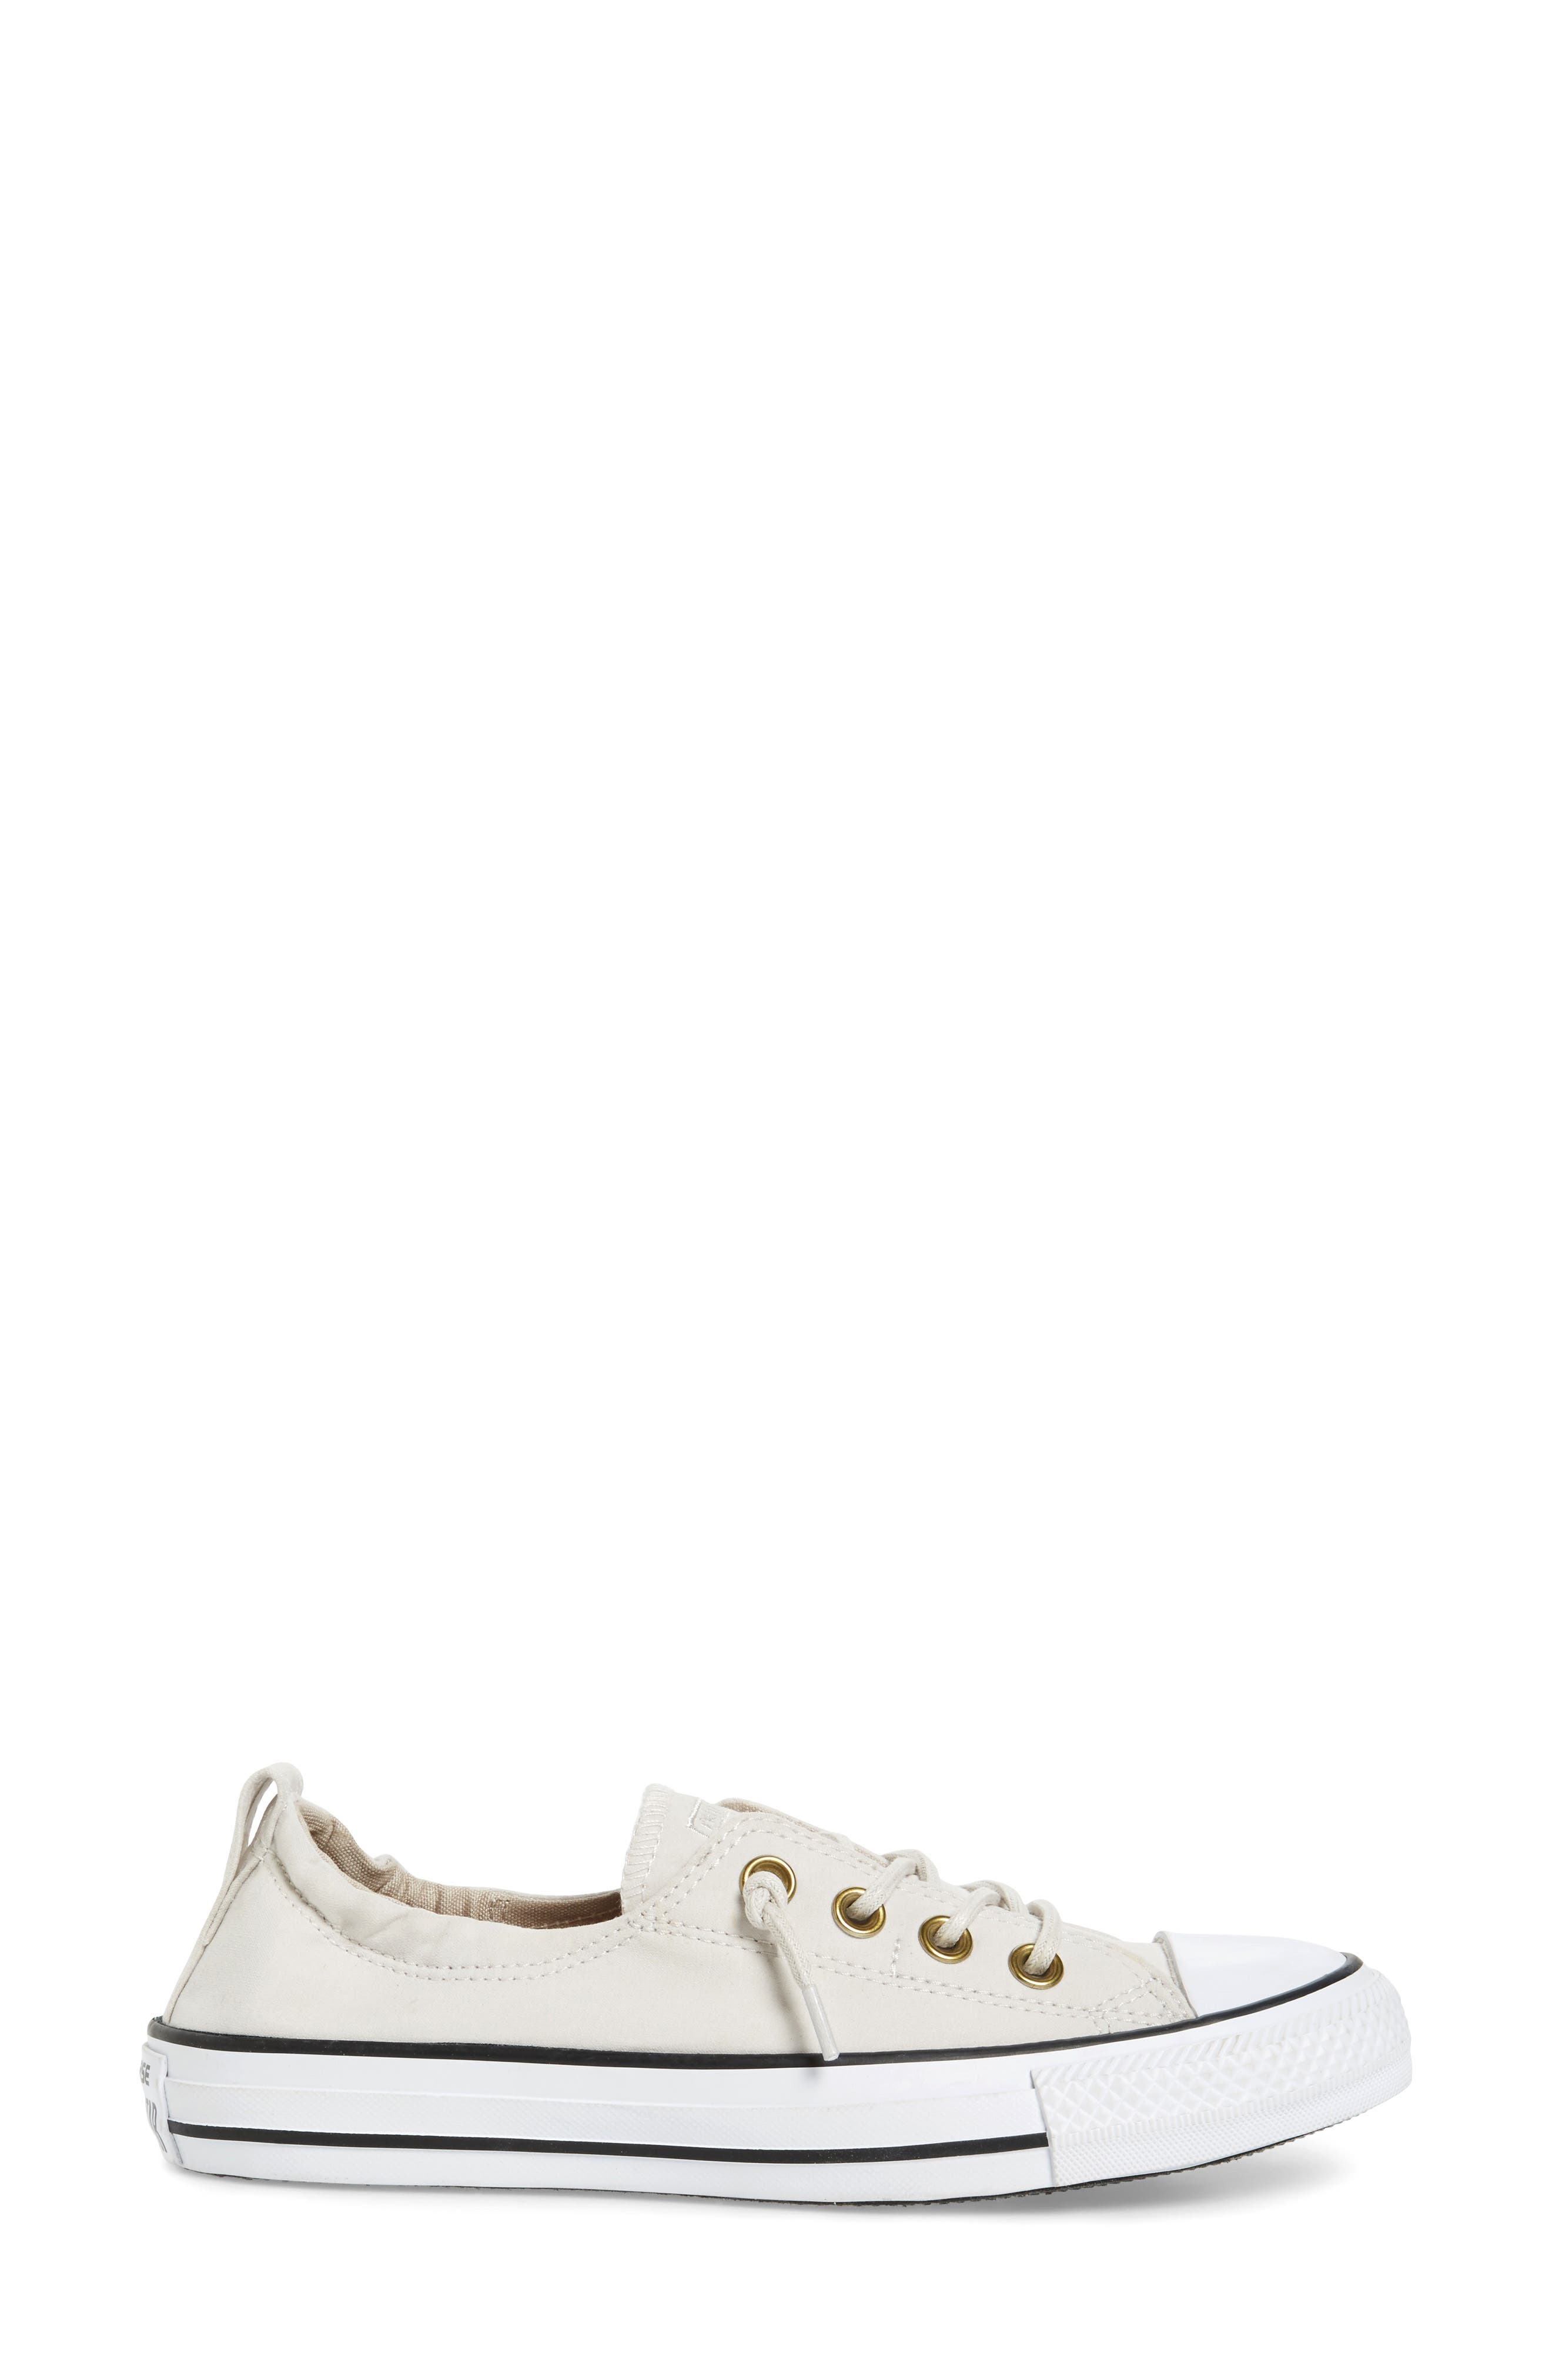 Alternate Image 3  - Converse Chuck Taylor® All Star® Shoreline Peached Twill Sneaker (Women)